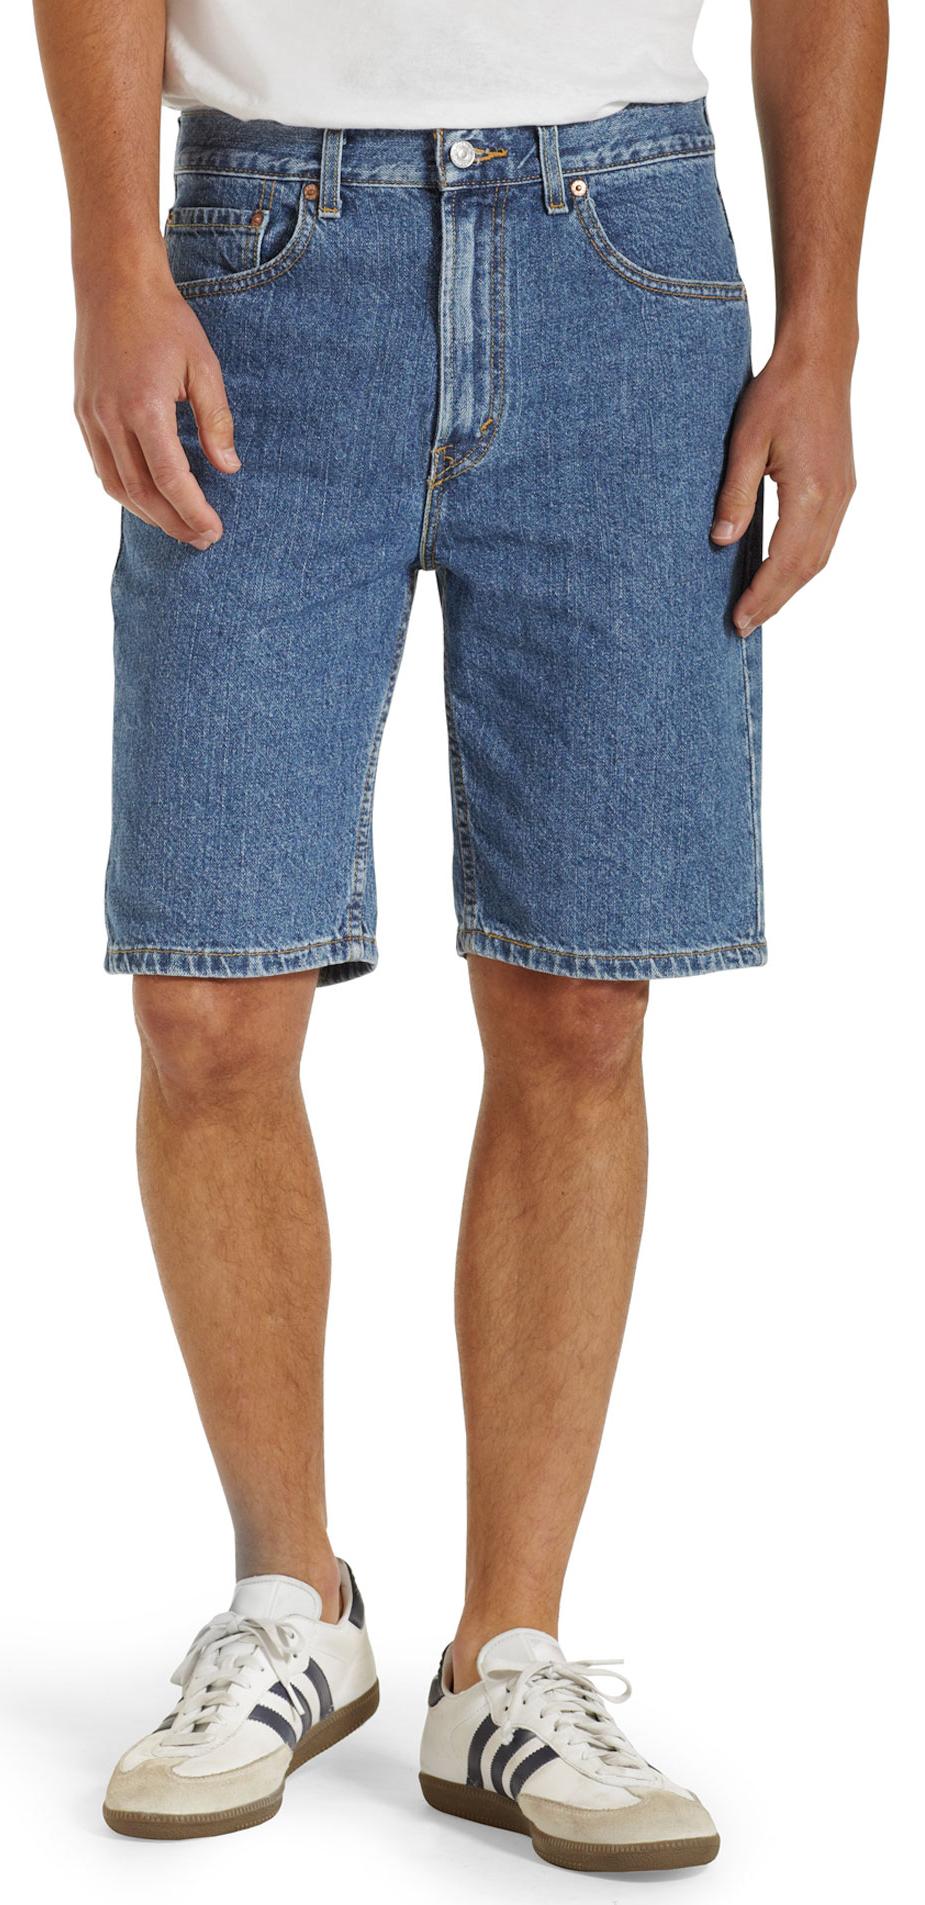 Шорты мужские джинсовые Levis 550™ Relaxed Fit Short